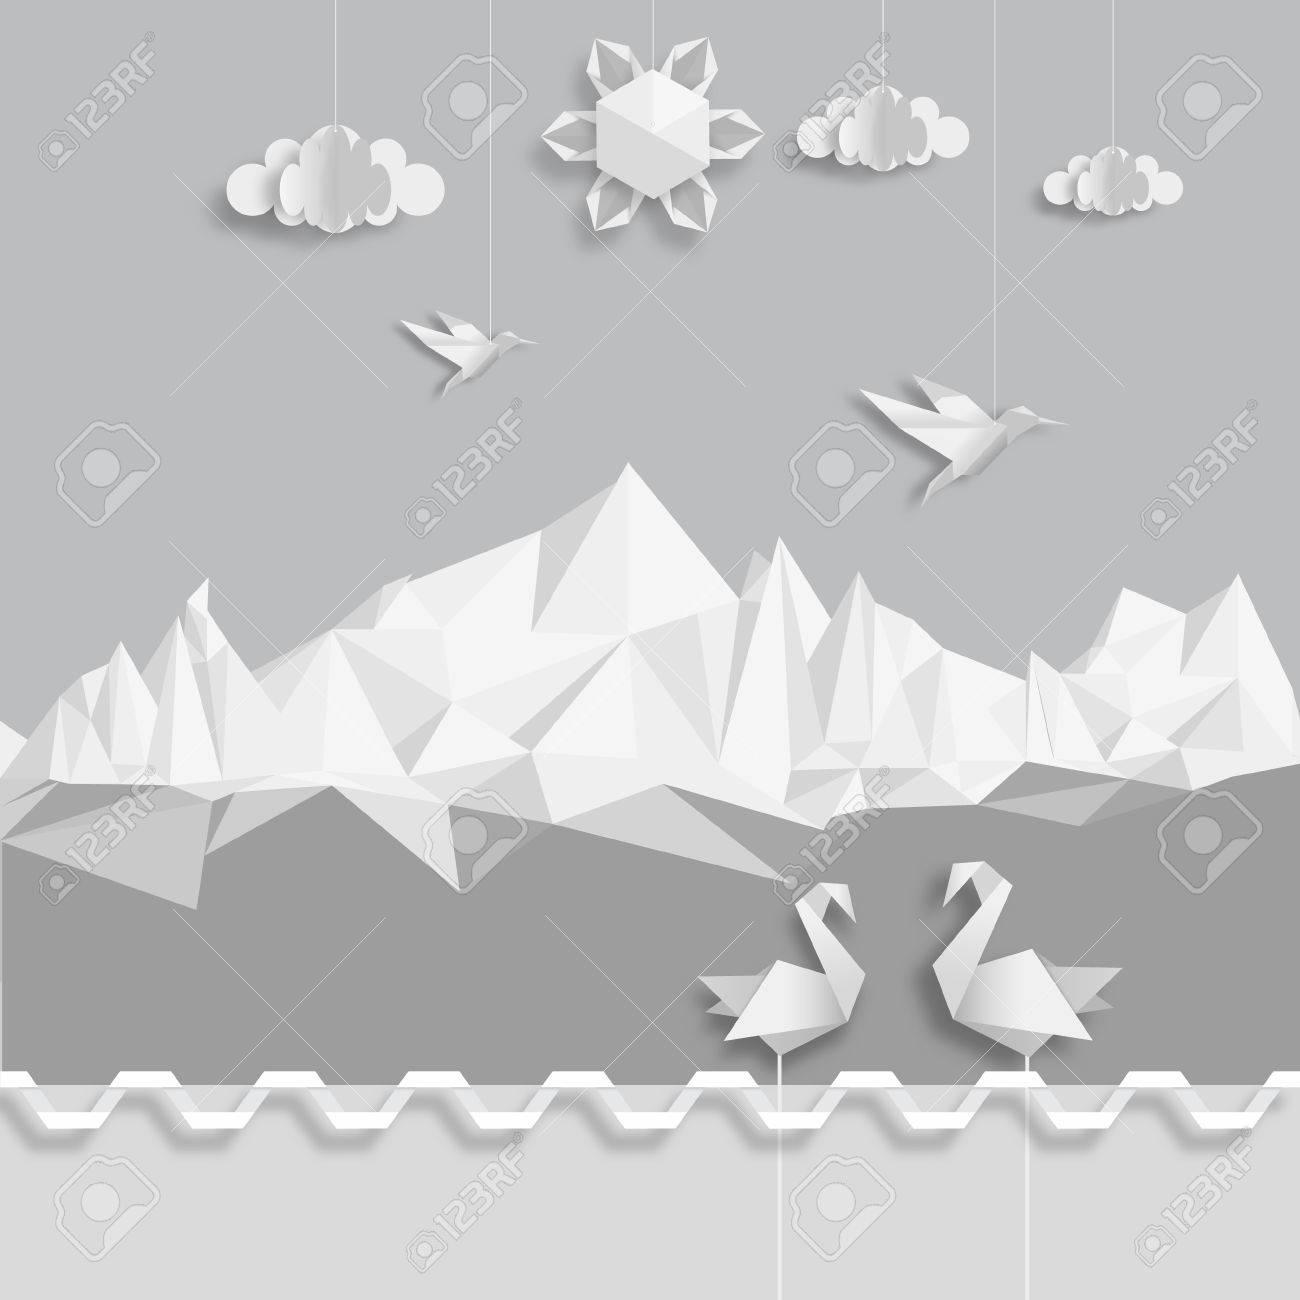 realistic illustration of origami